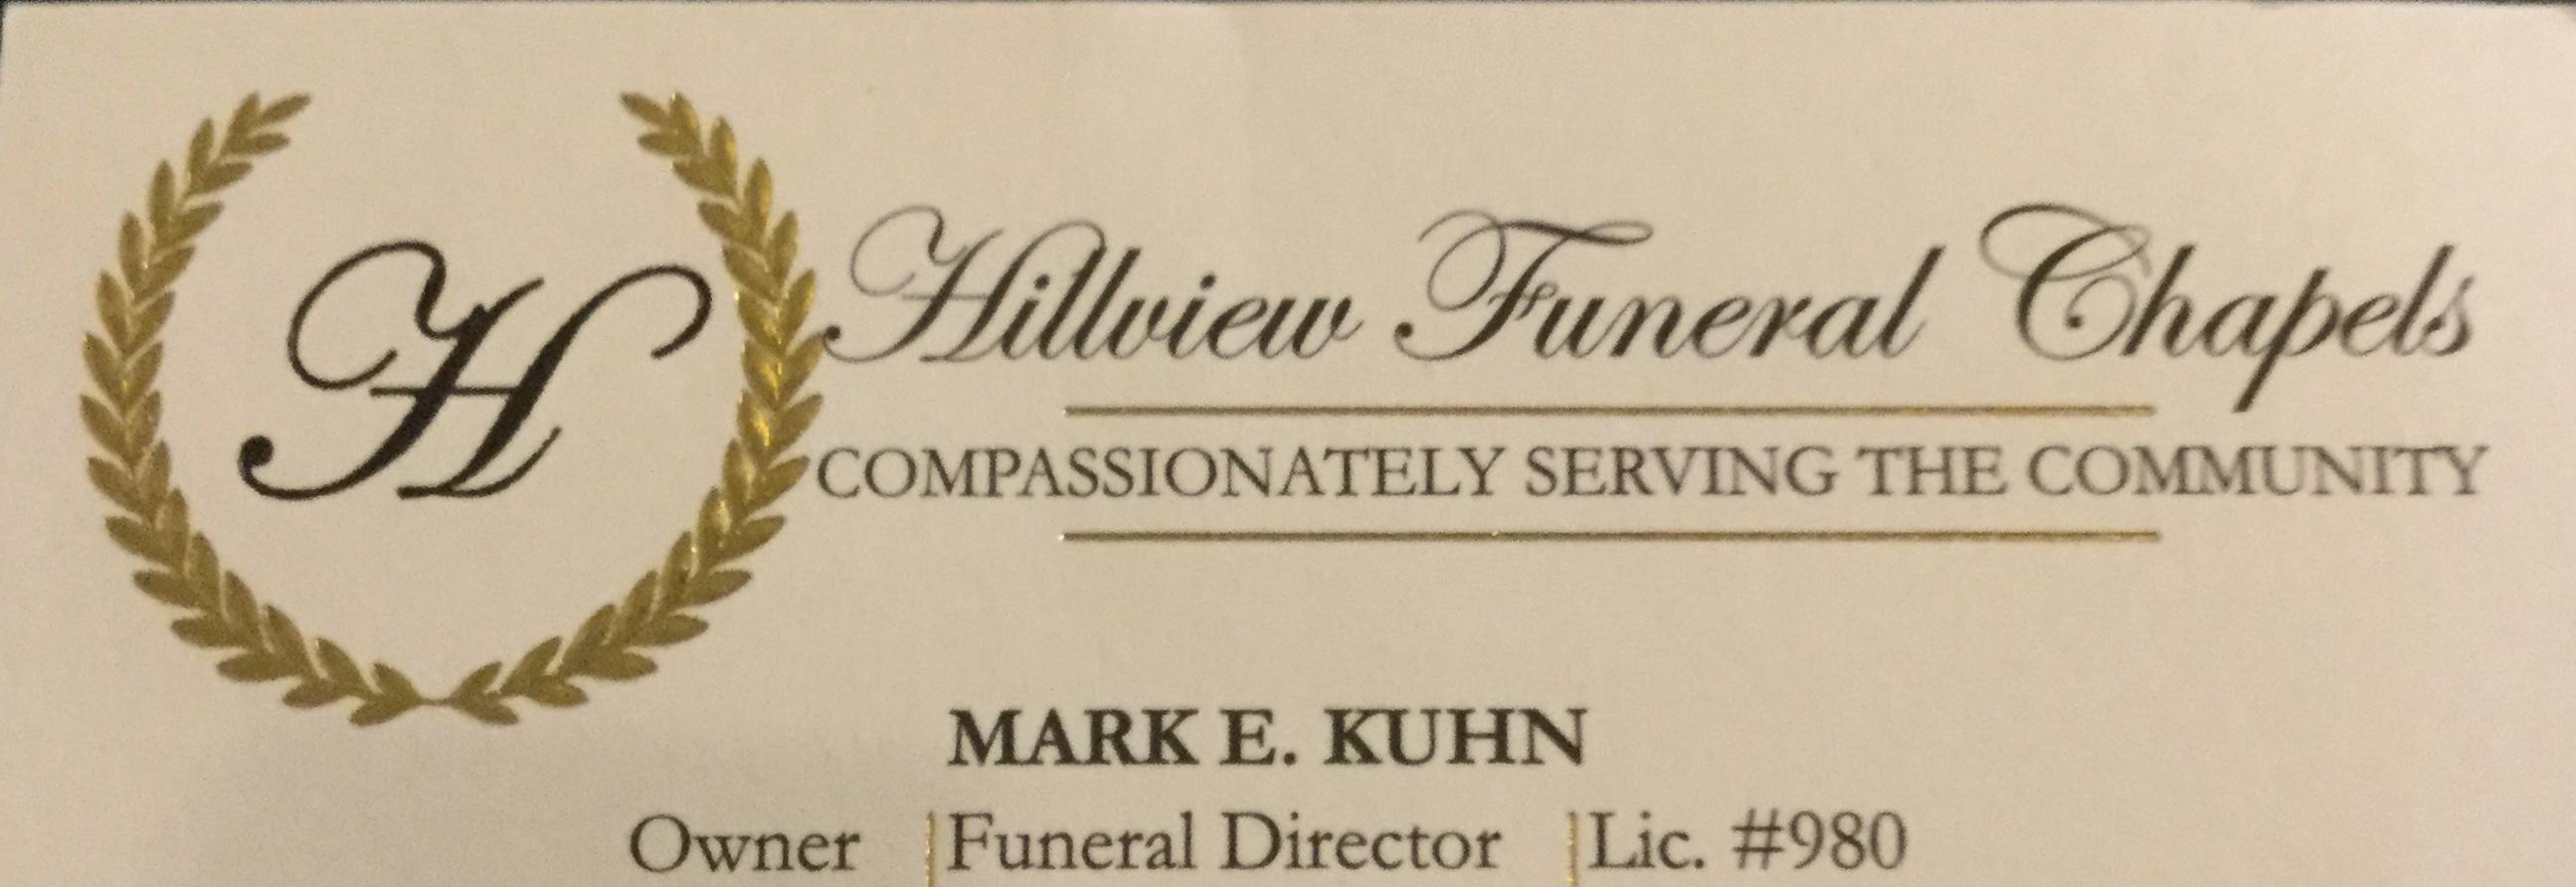 Hillview Funeral Chapels